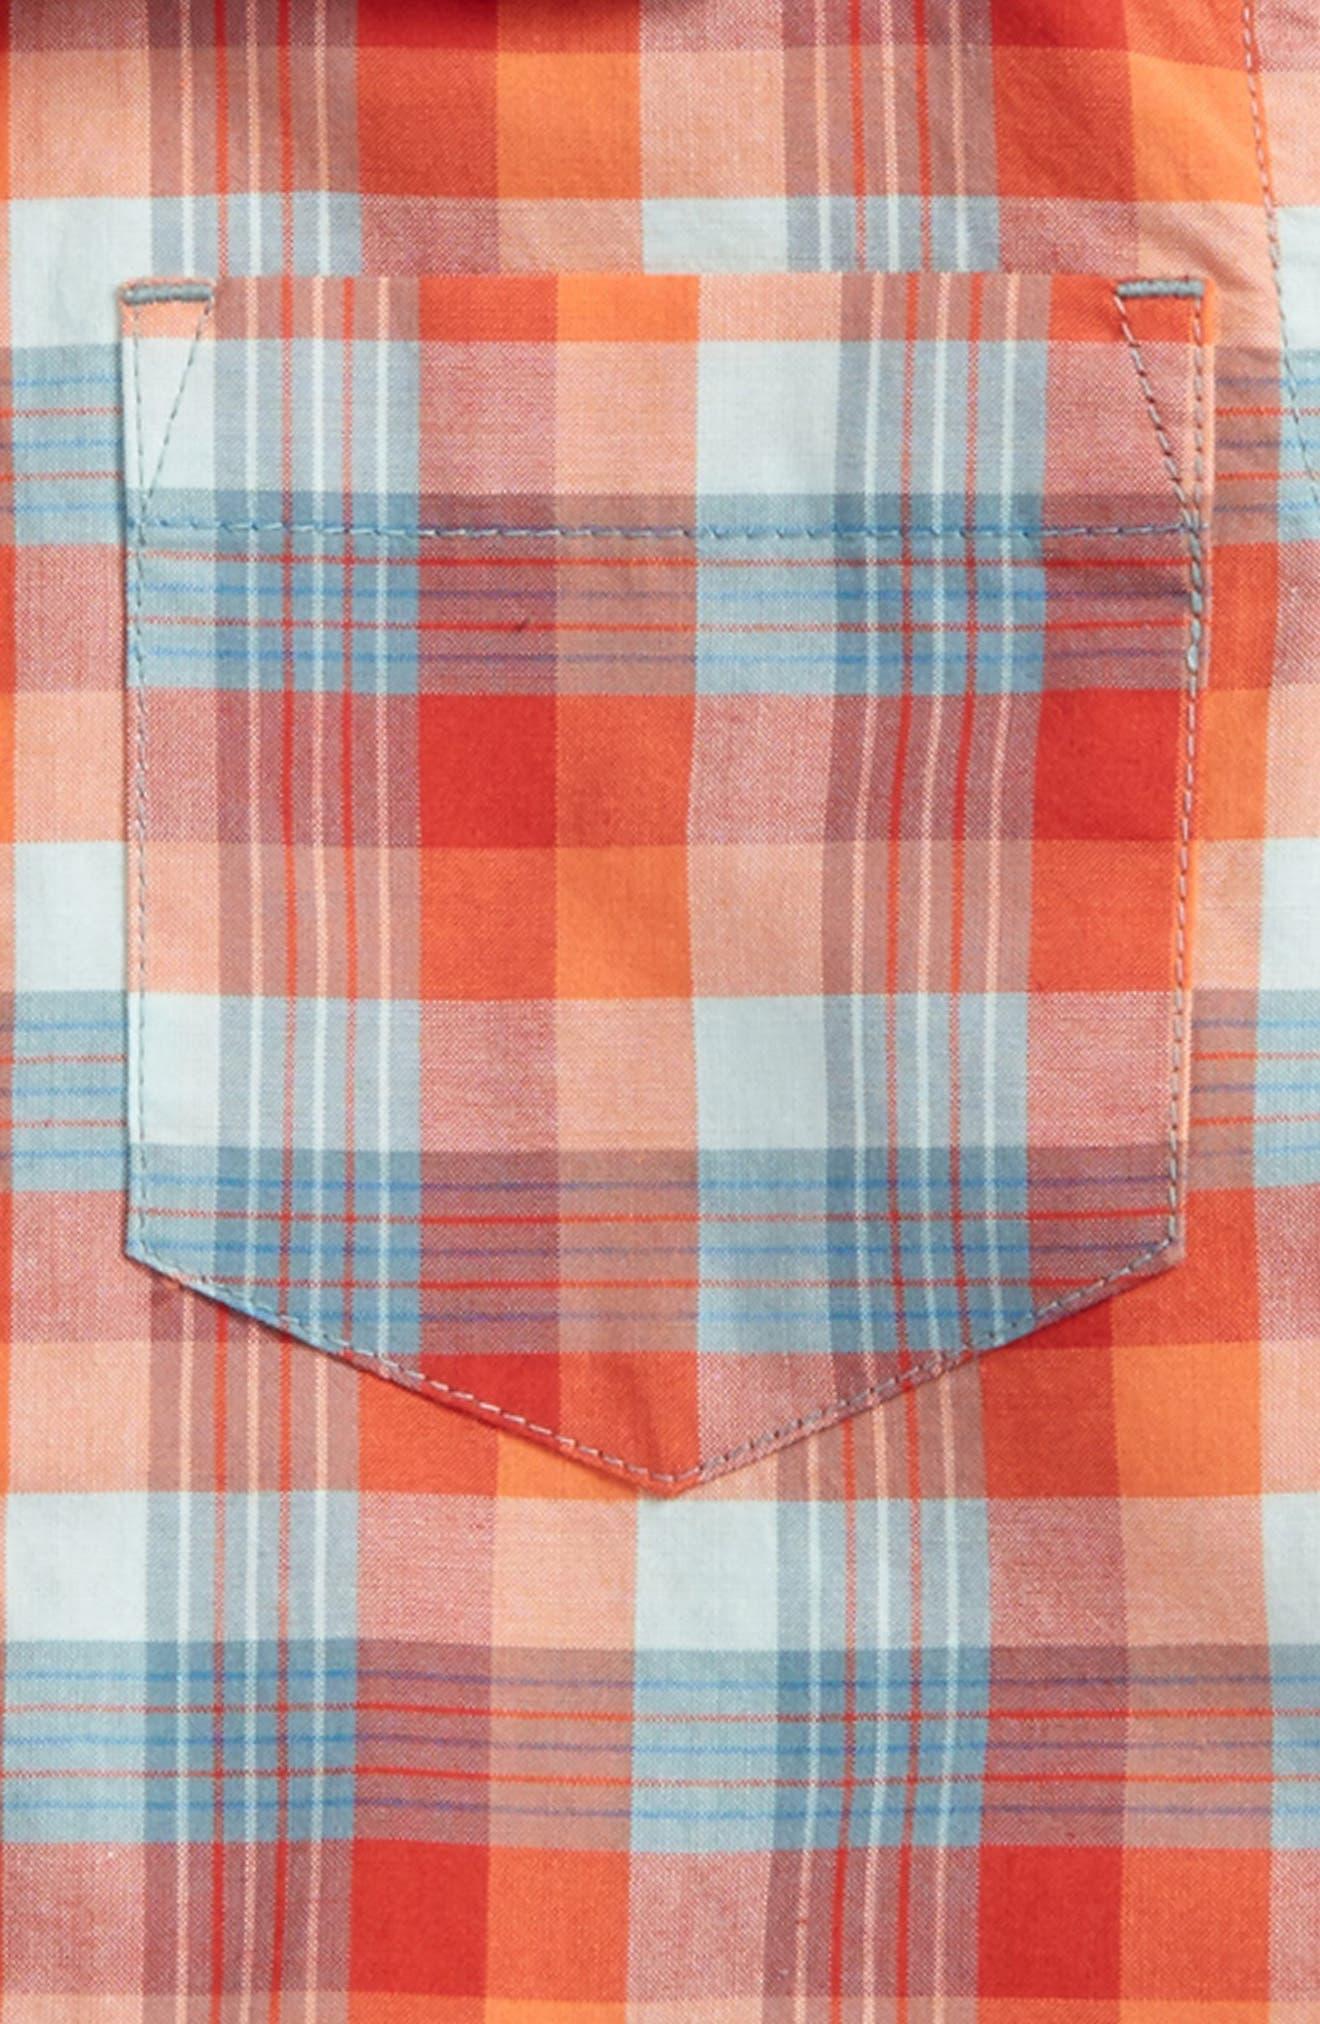 Plaid Short Sleeve Shirt,                             Alternate thumbnail 2, color,                             618